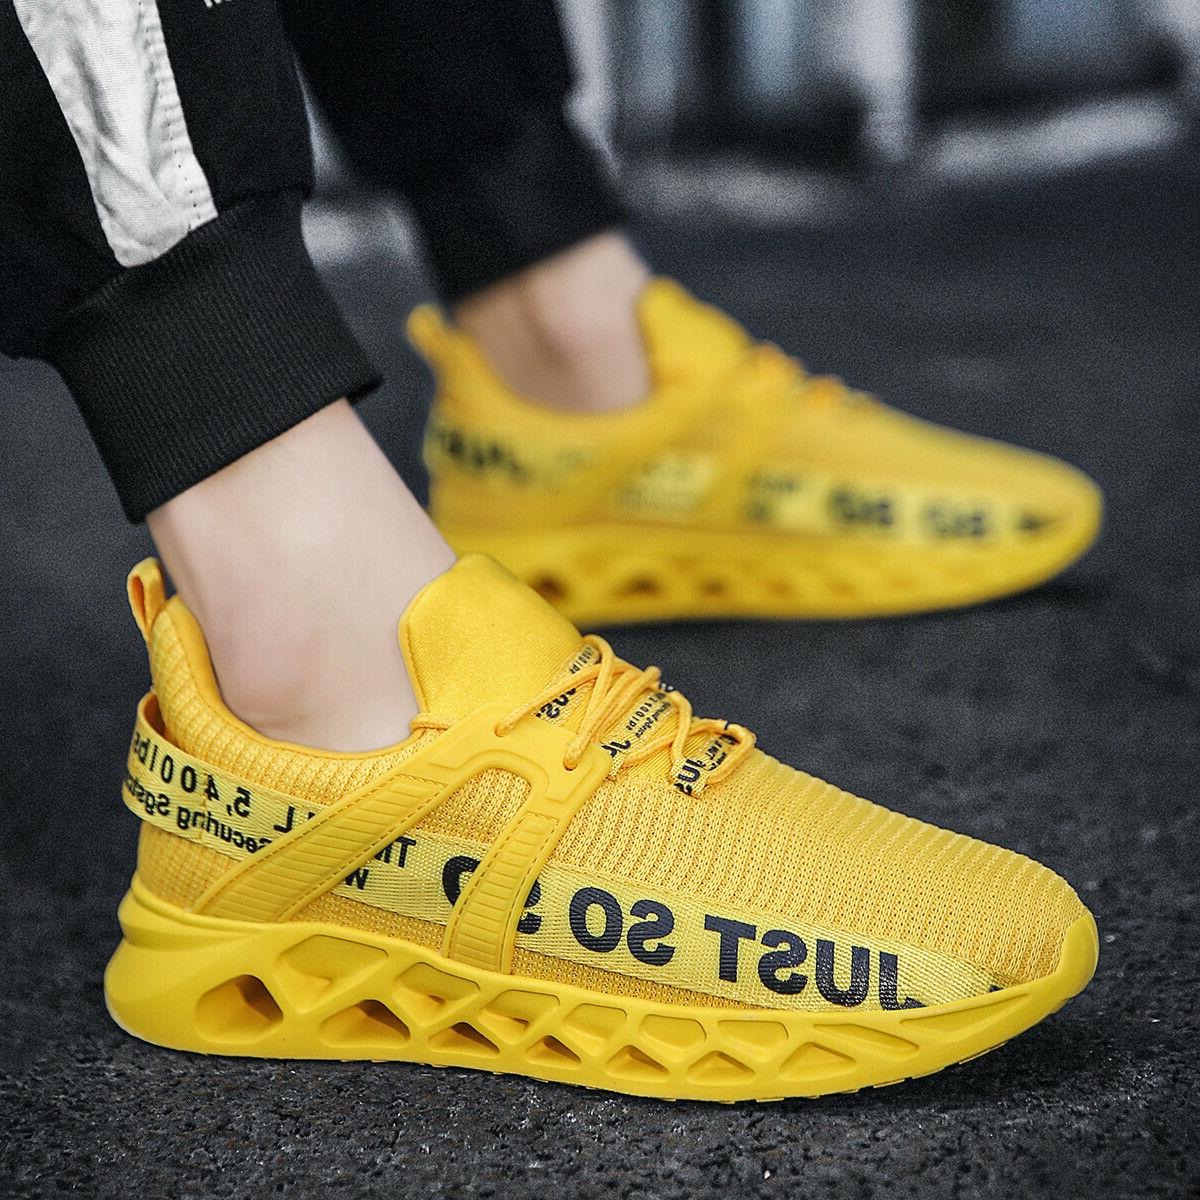 Men's Casual Walking Outdoor Sports Tennis Sneakers